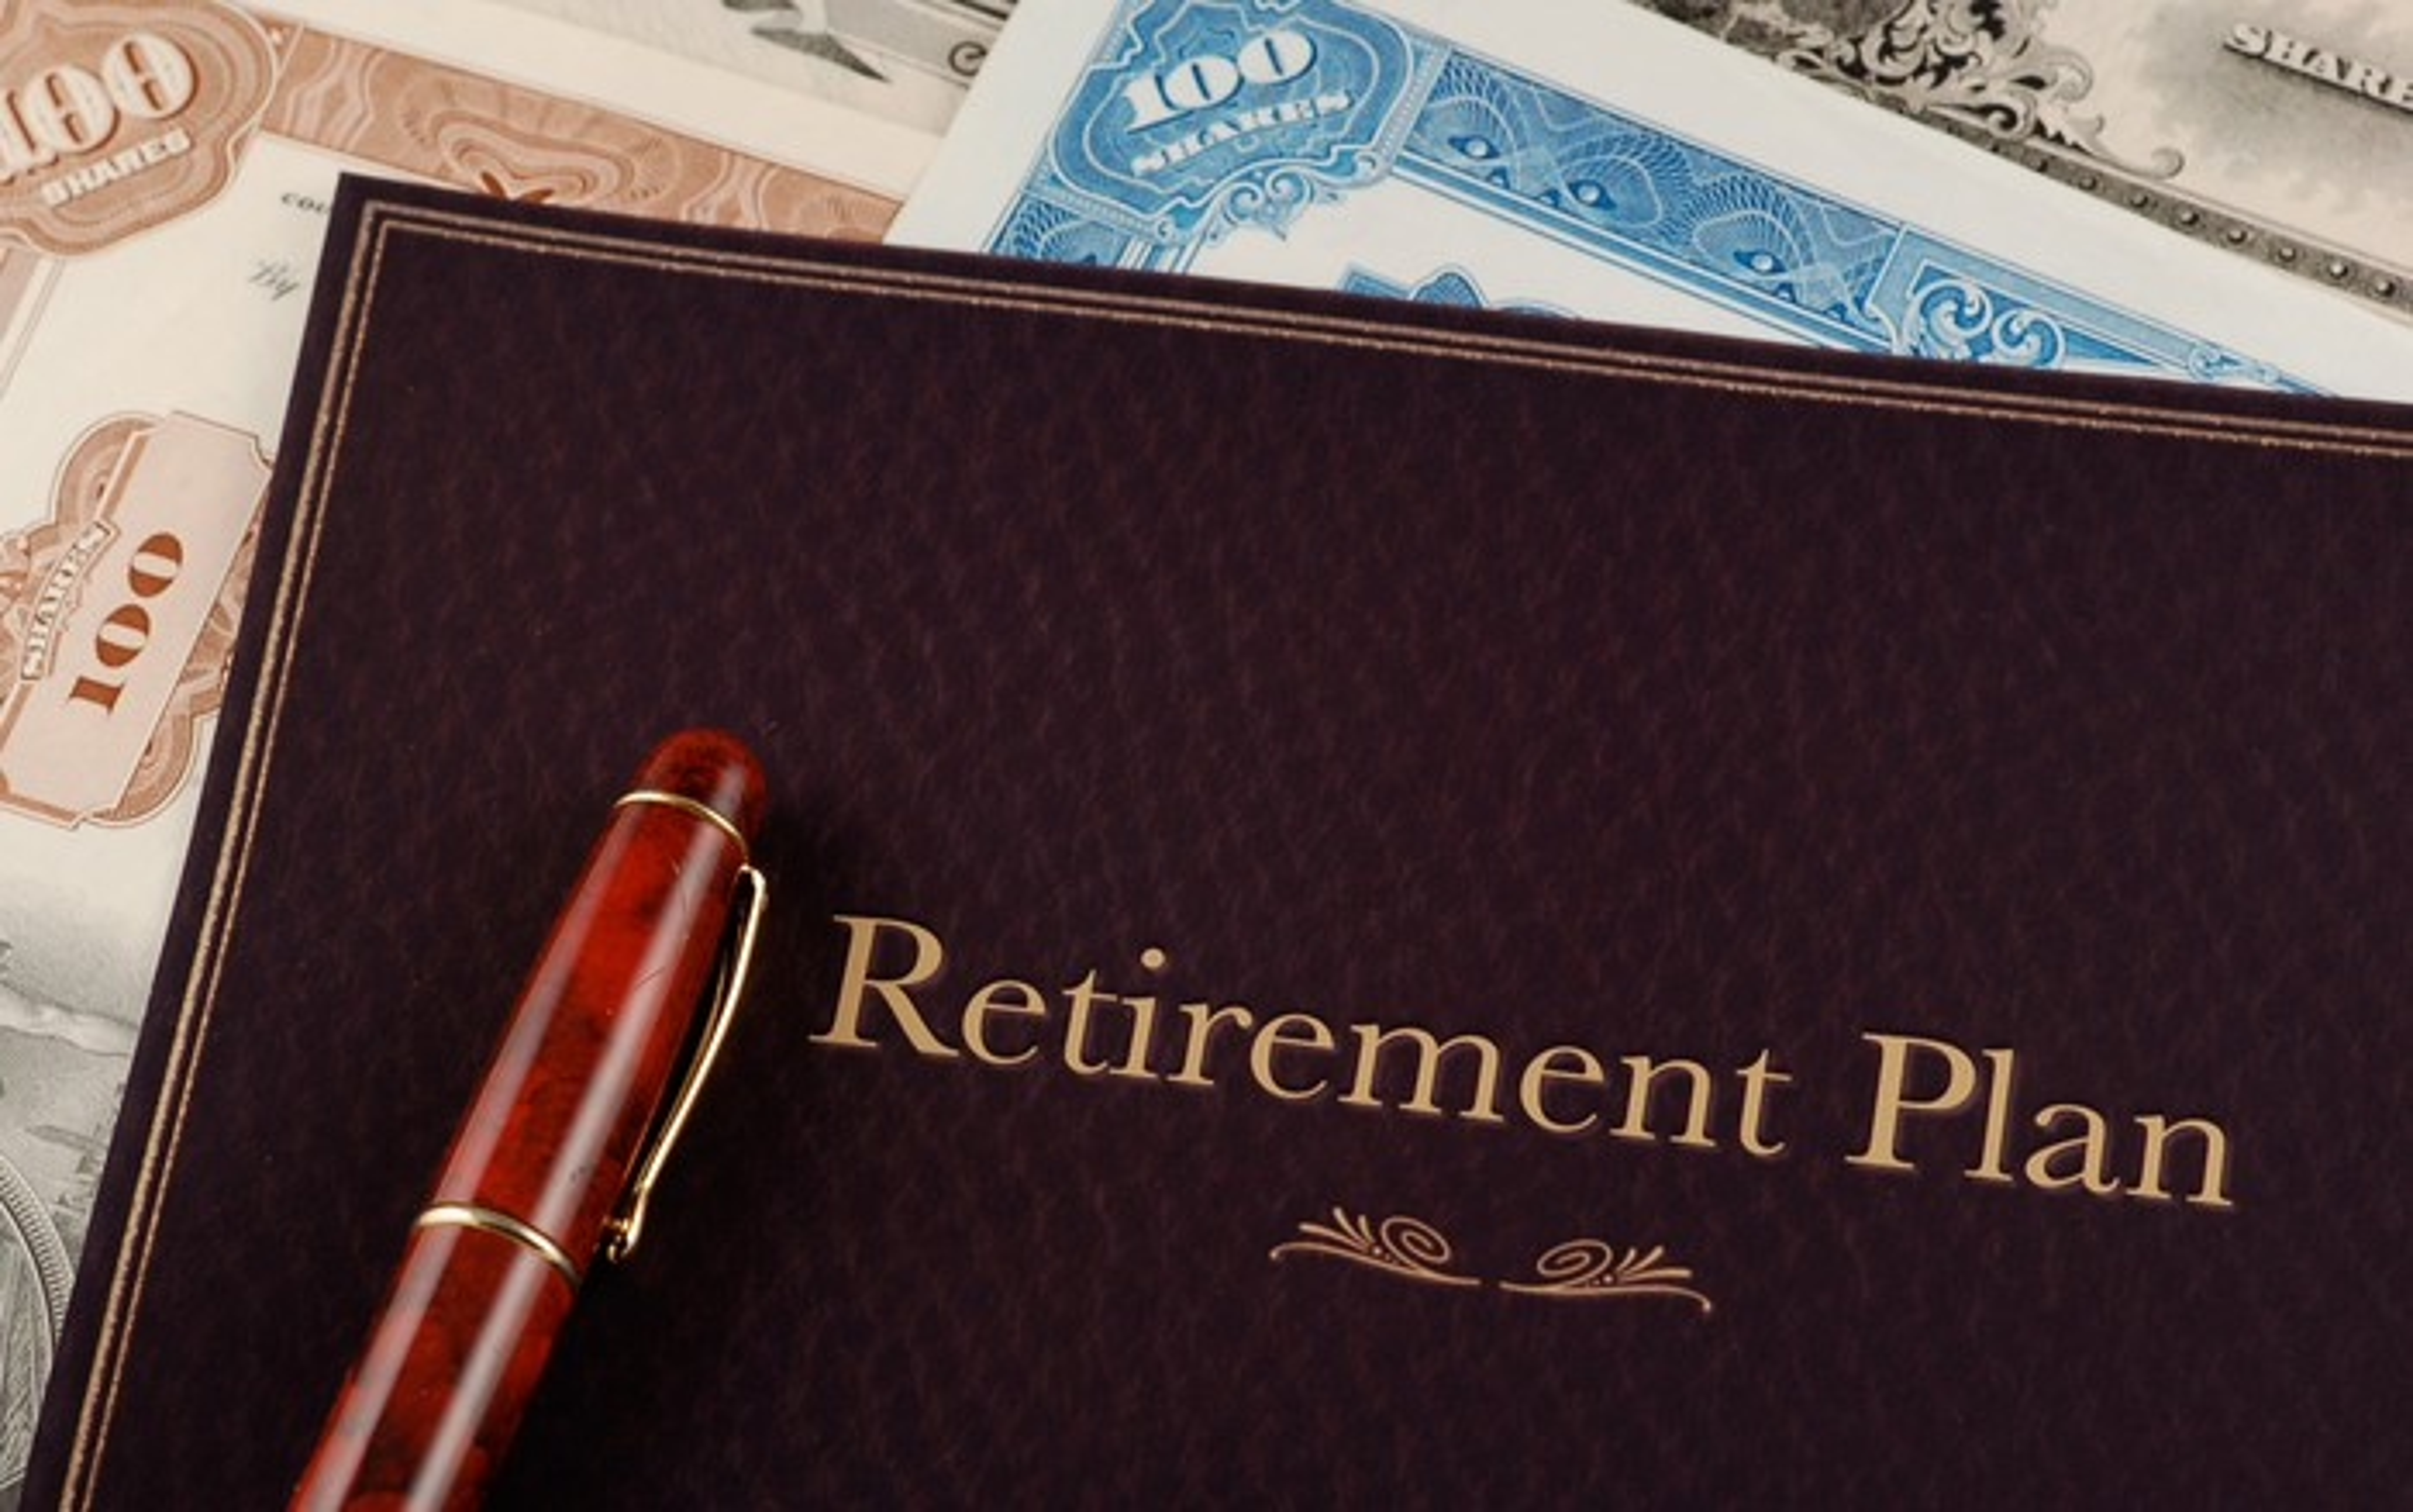 Retirement plan portfolio on top of stock certificates.